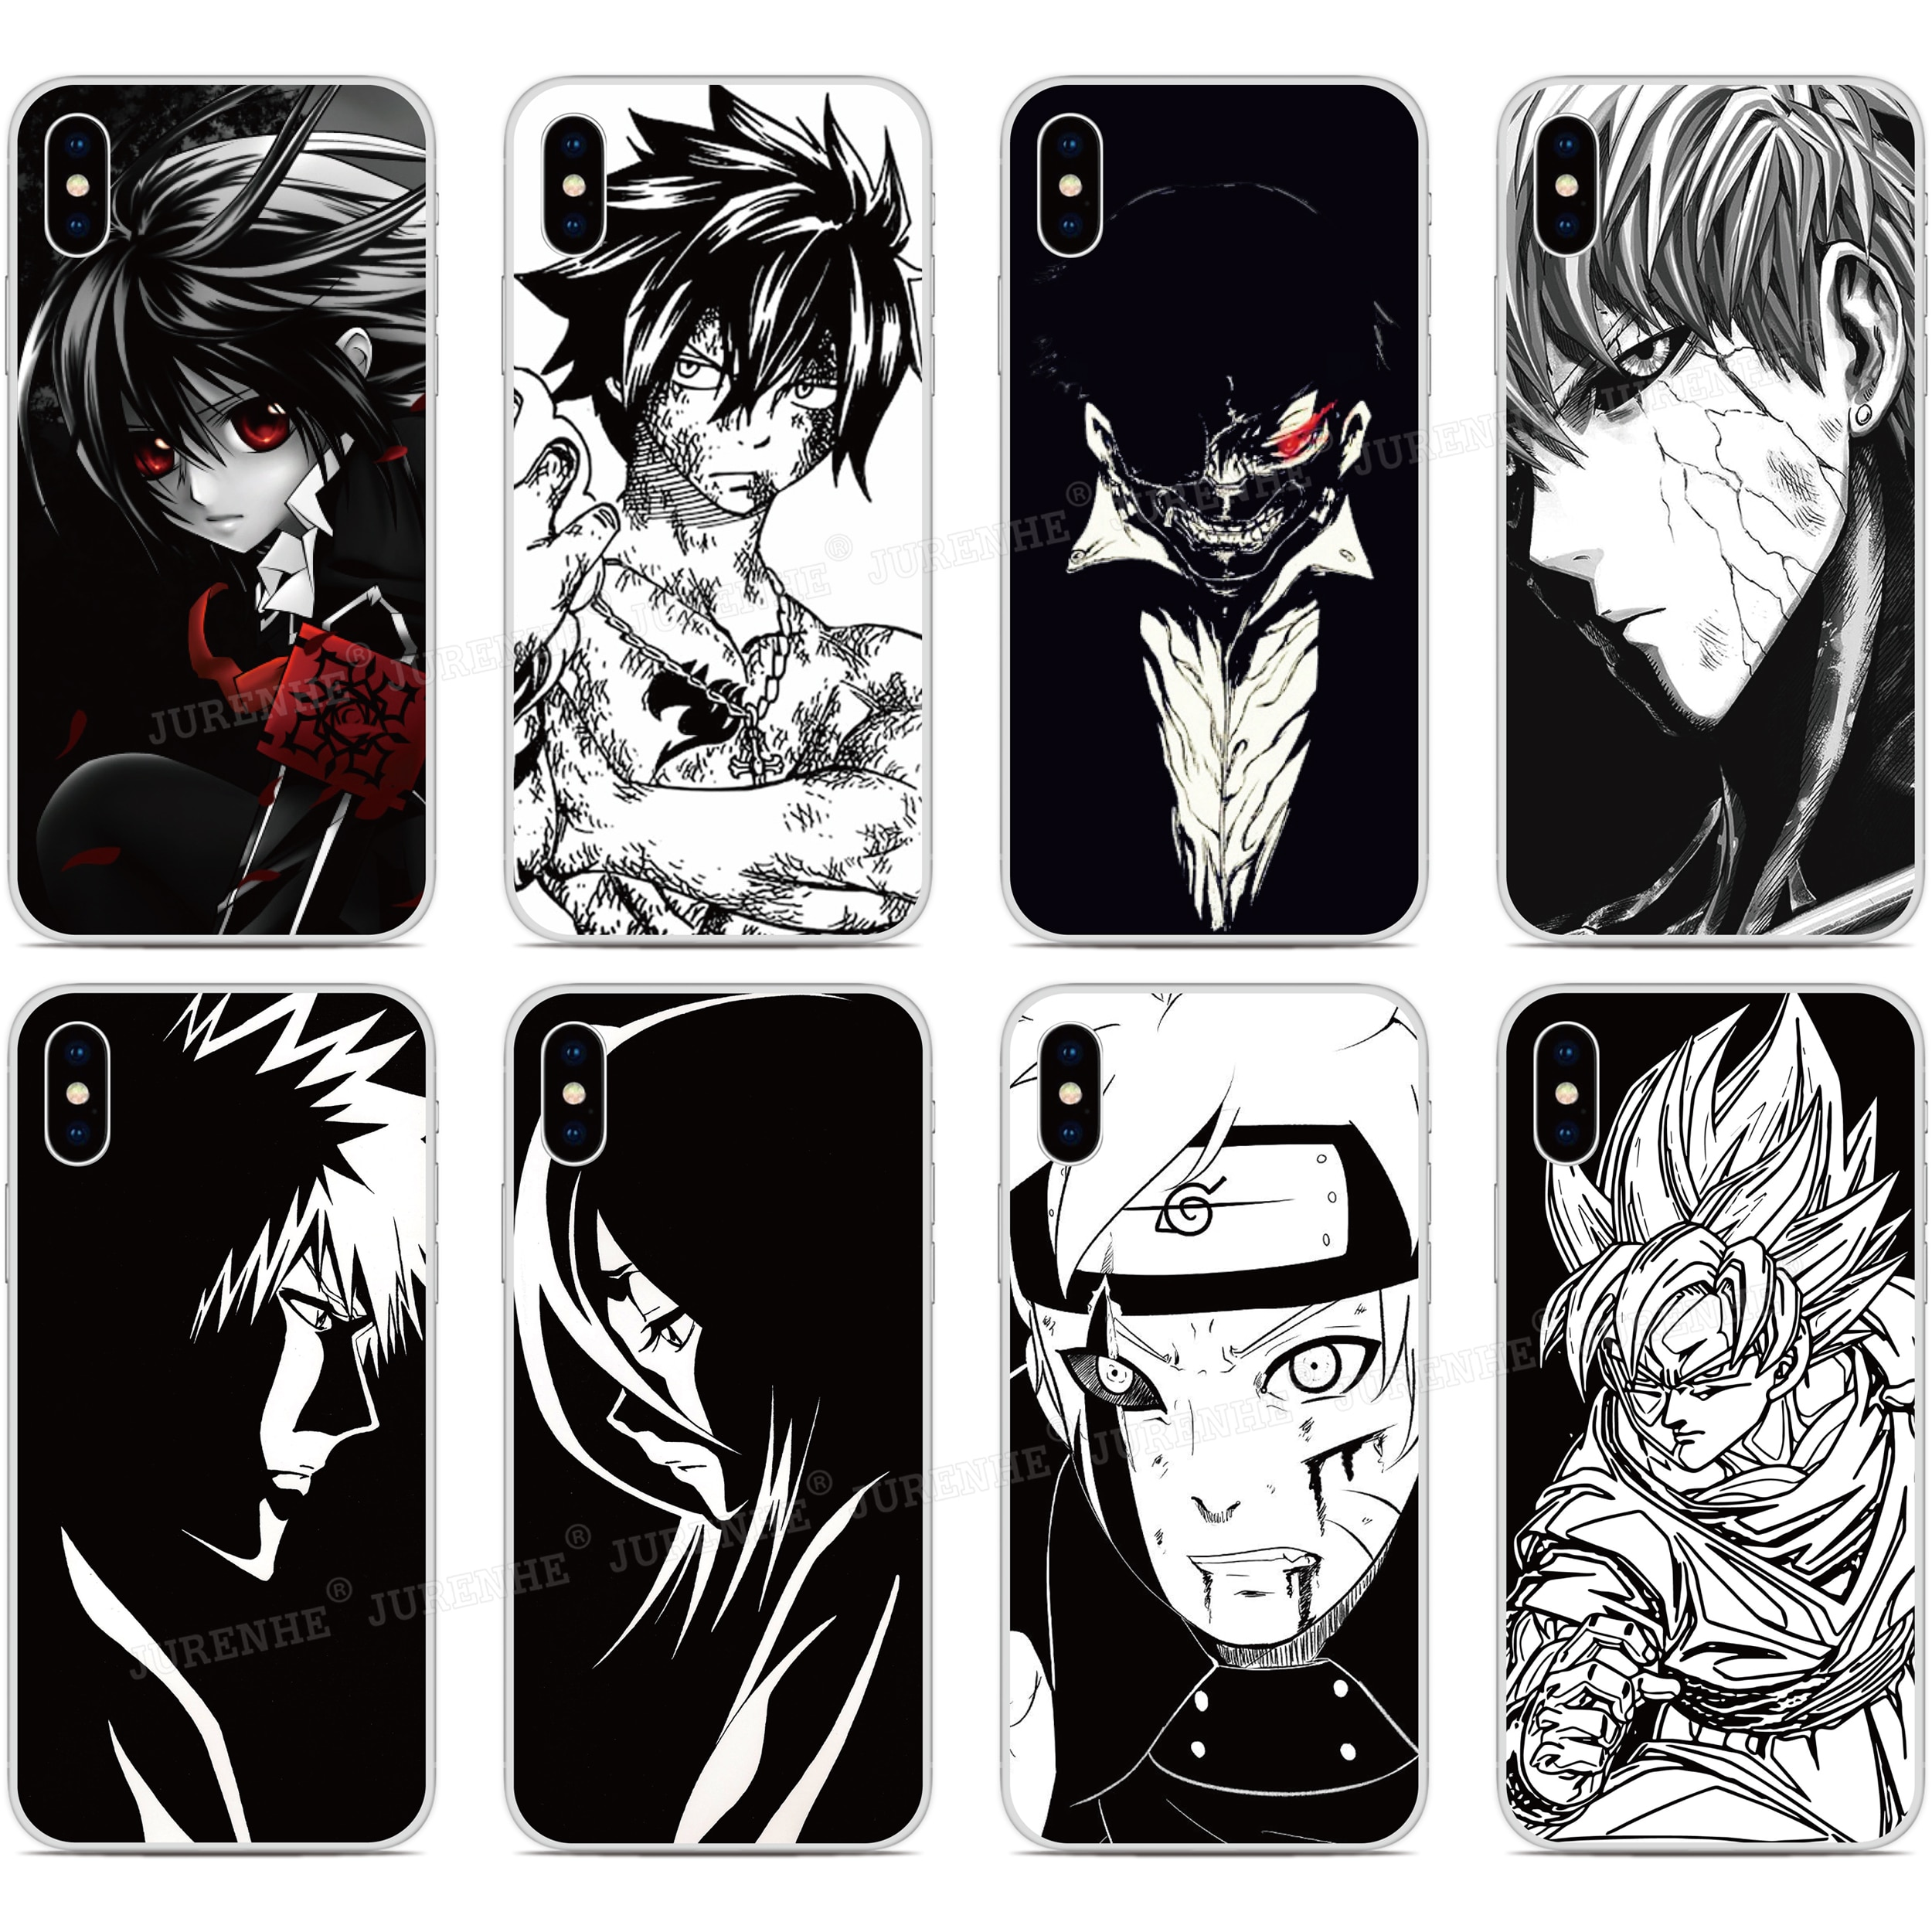 Schwarz Weiß Anime Weiche TPU Telefon Fall Für ZTE Blade A5 A7 2020 A3 L8 2019 Axon 10 Pro 5G V2020 V9 V10 Vita A7s 20 Smart Abdeckung